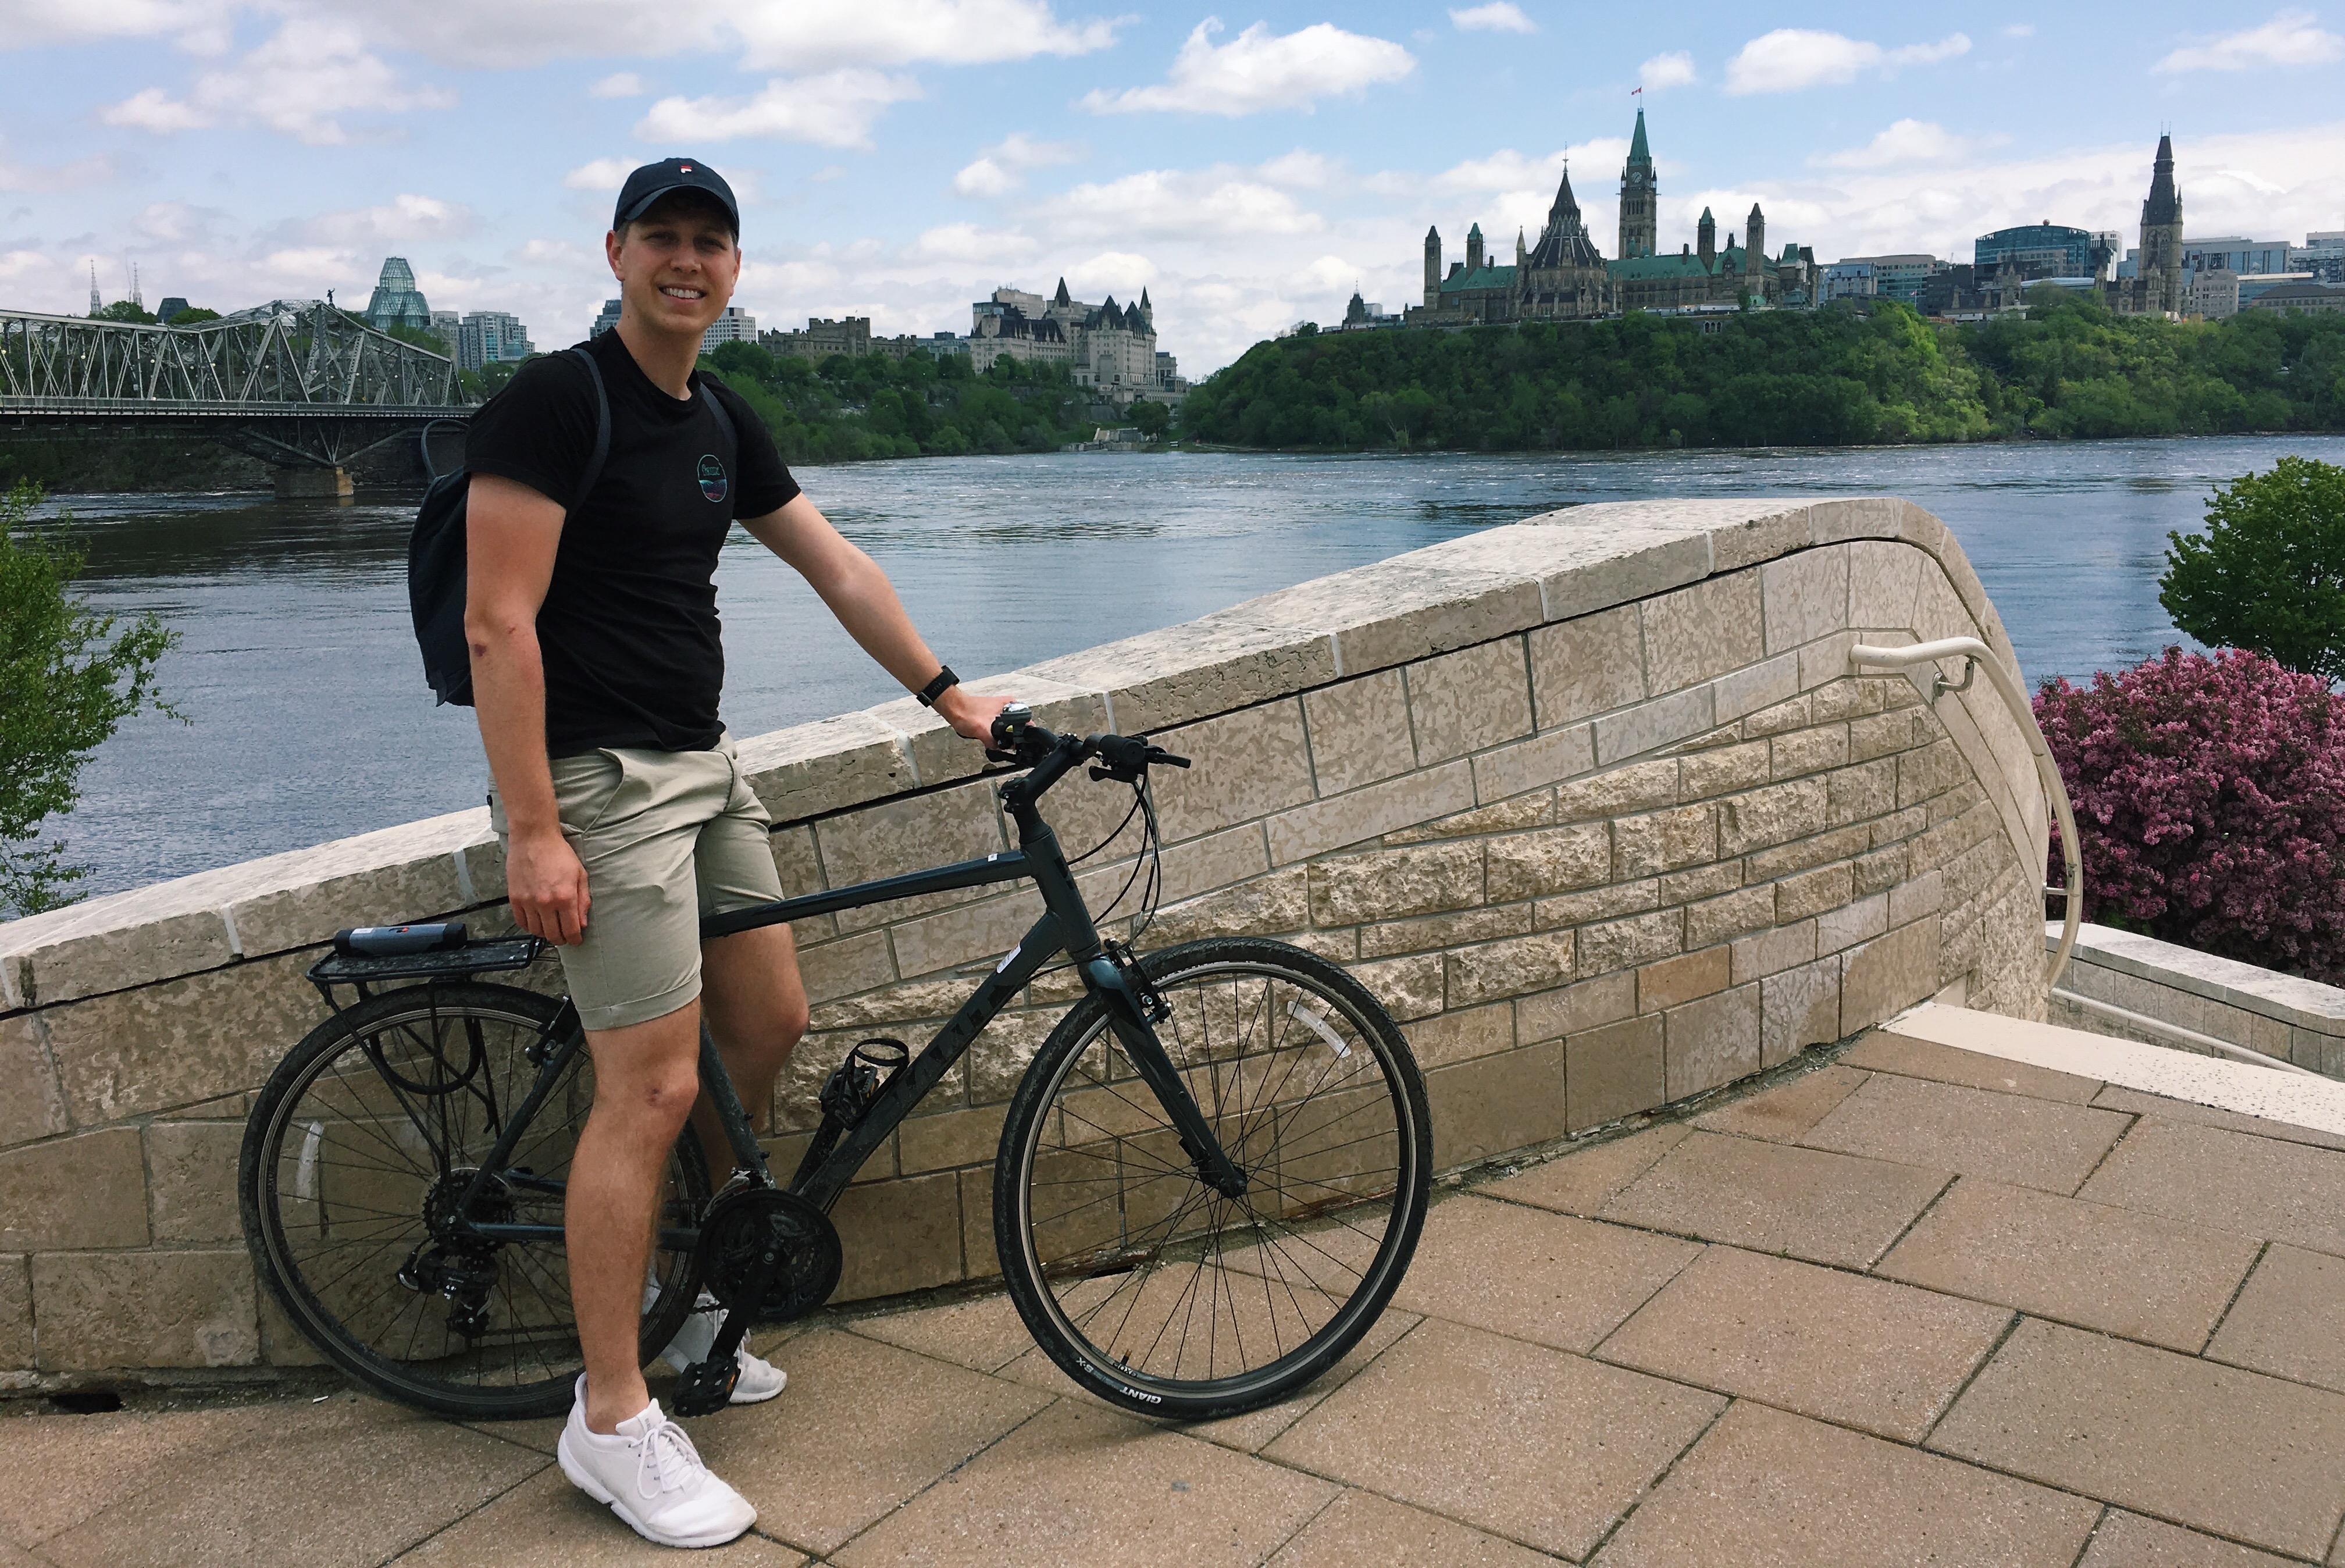 gatineau bike ride ottawa things to do